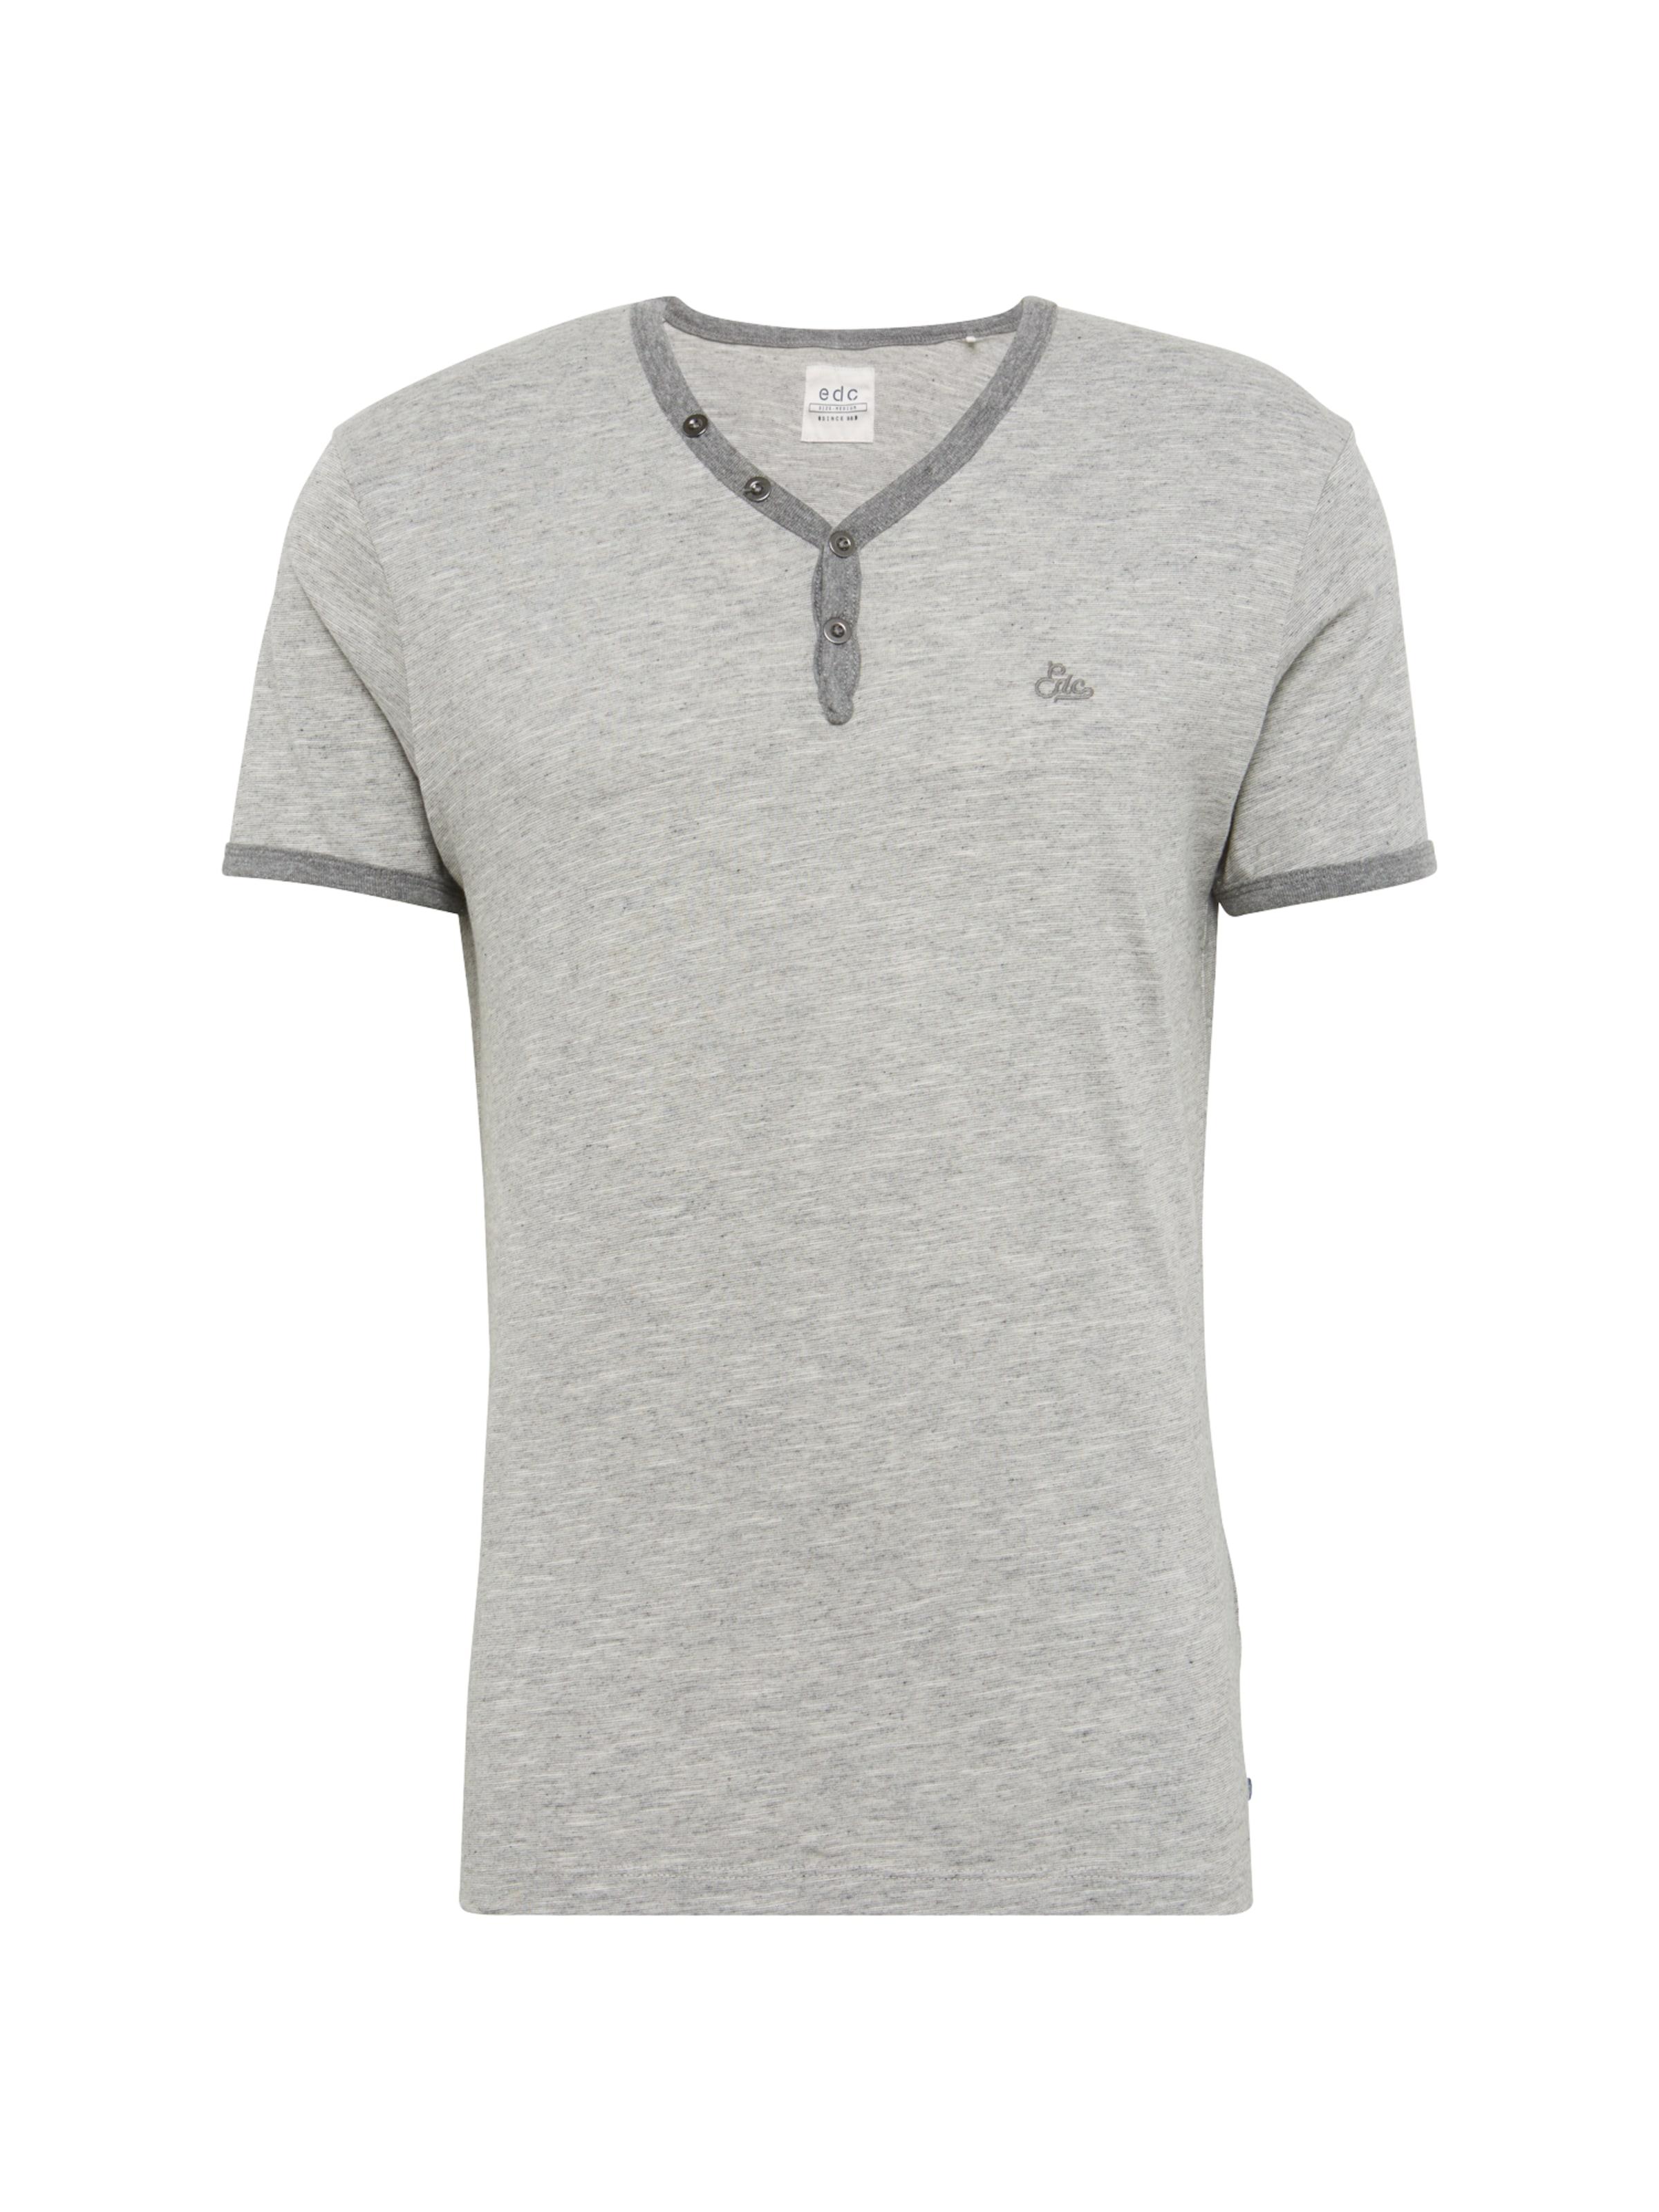 Gris Edc Chiné 'sg shirt EspritT By In 068cc2k012' MzSUpqV